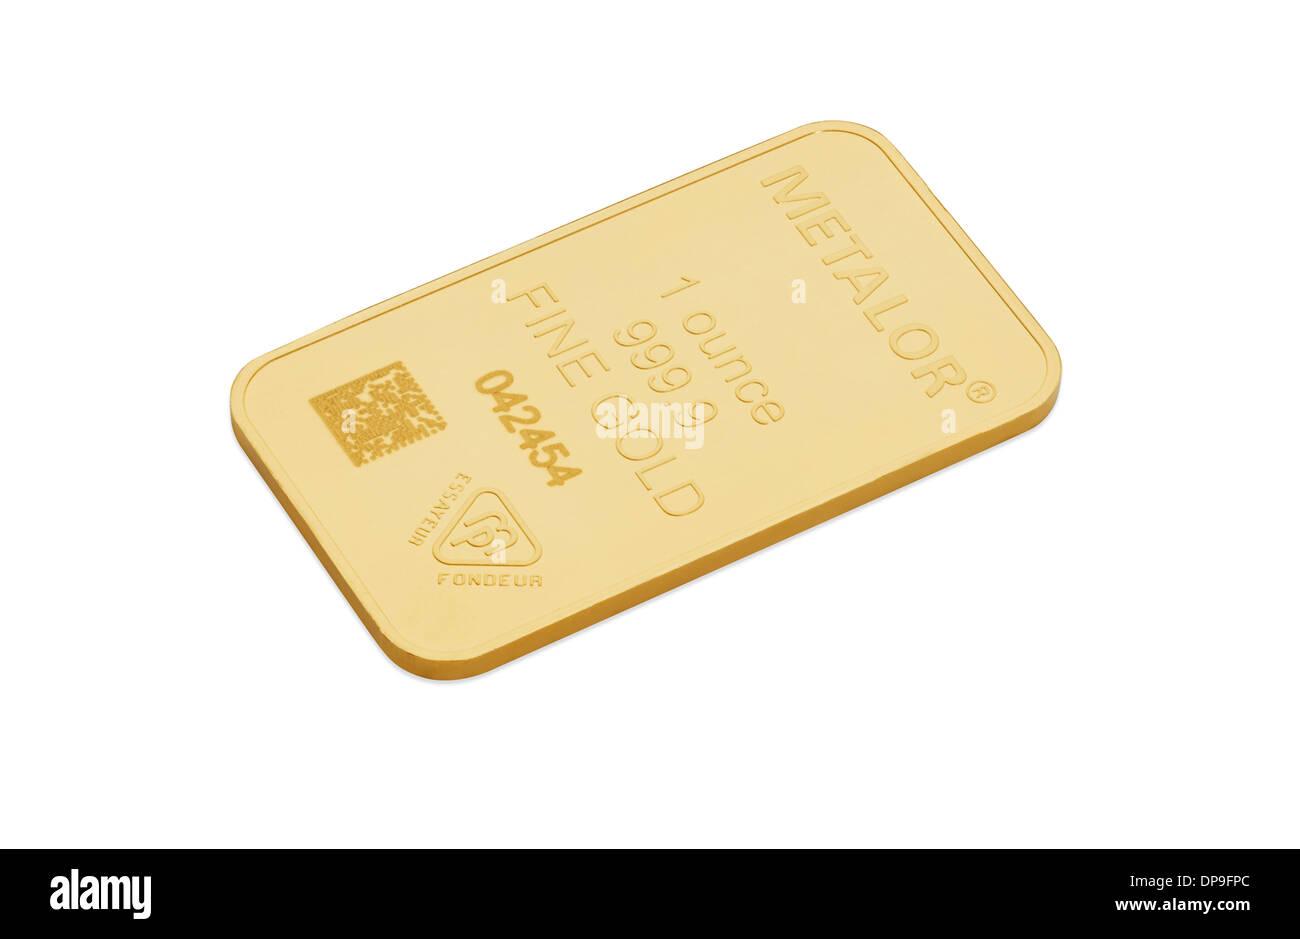 1 ounce of gold as fine gold bullion bar - Stock Image